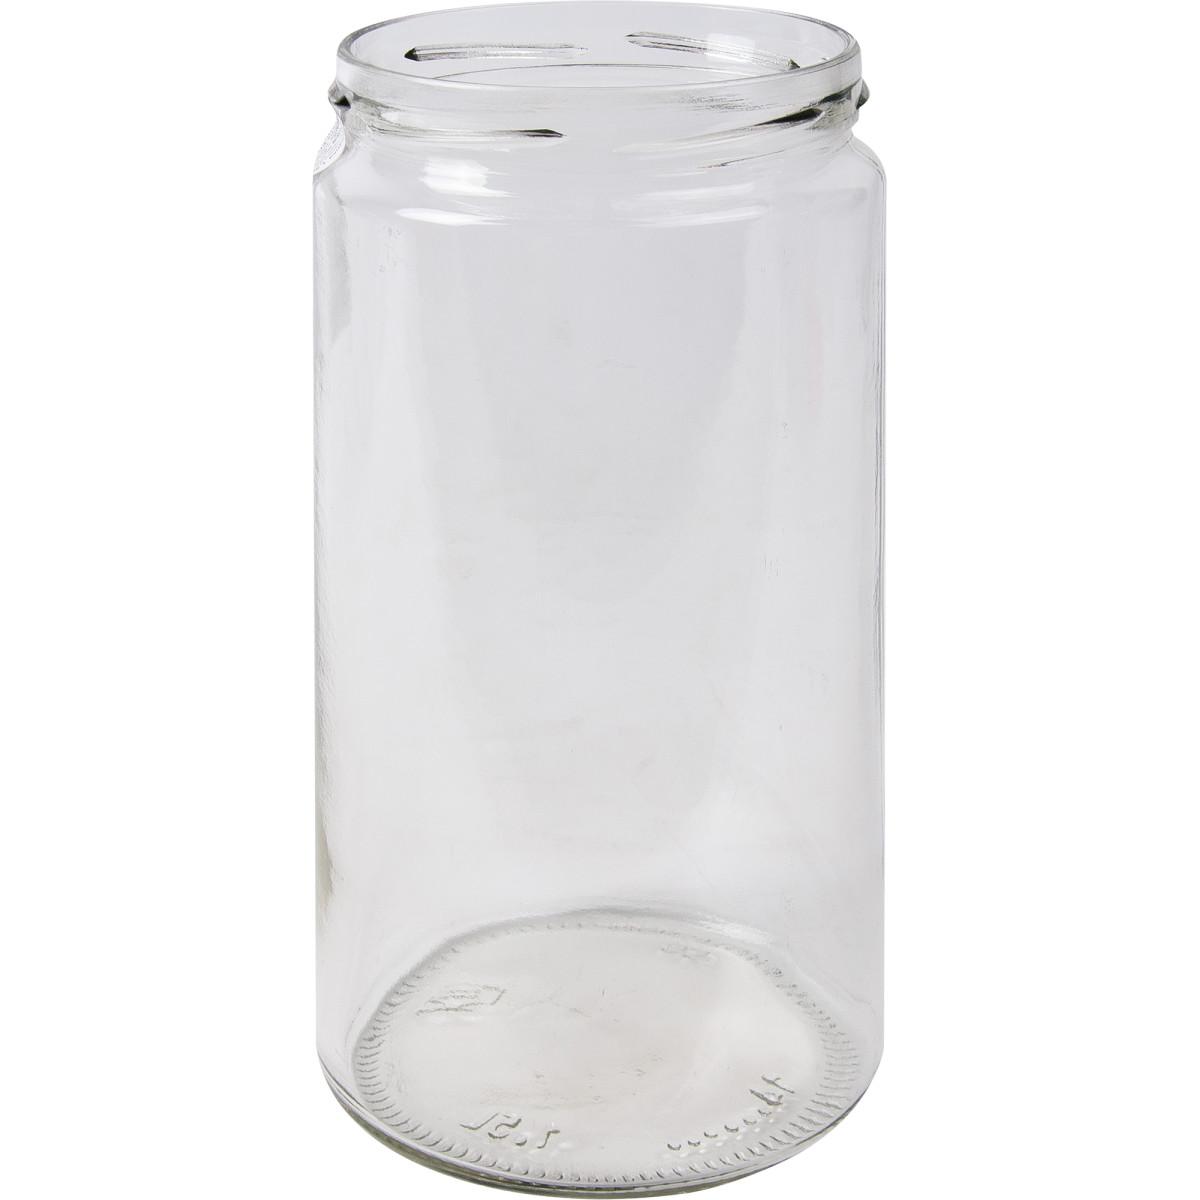 Банка стеклянная ТО-100 1.5 л